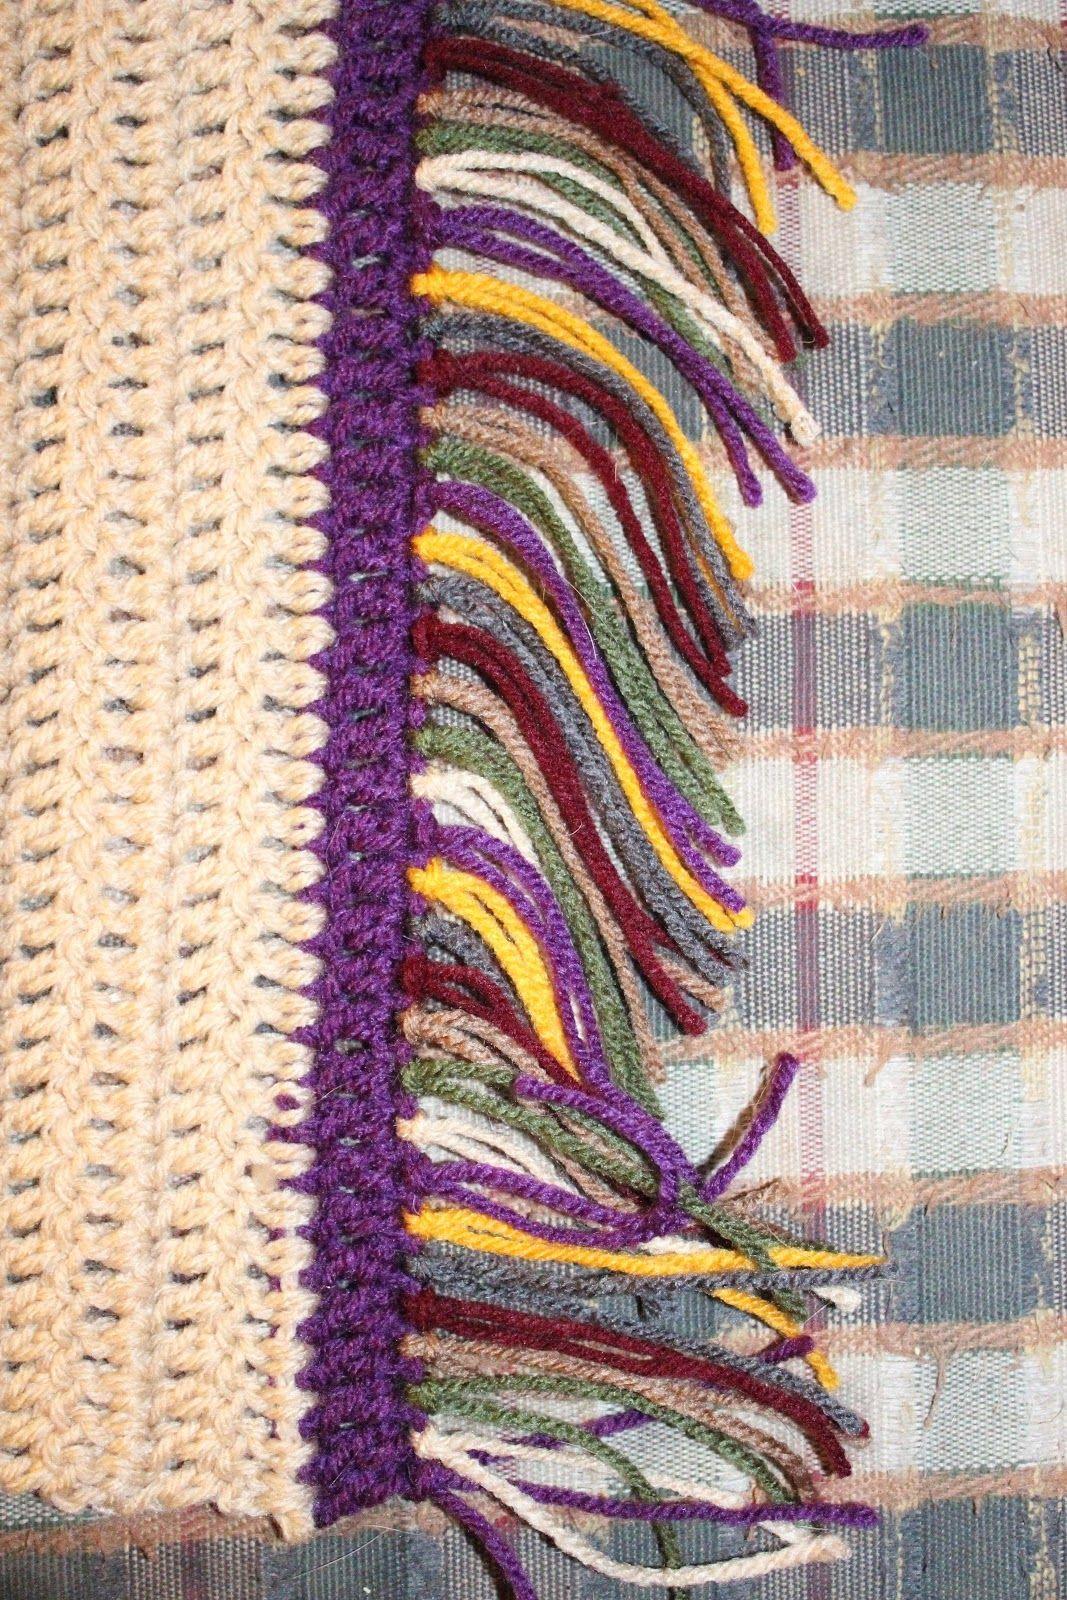 Doctor Who Fourth Doctors Scarf Crochet Pattern Crochet